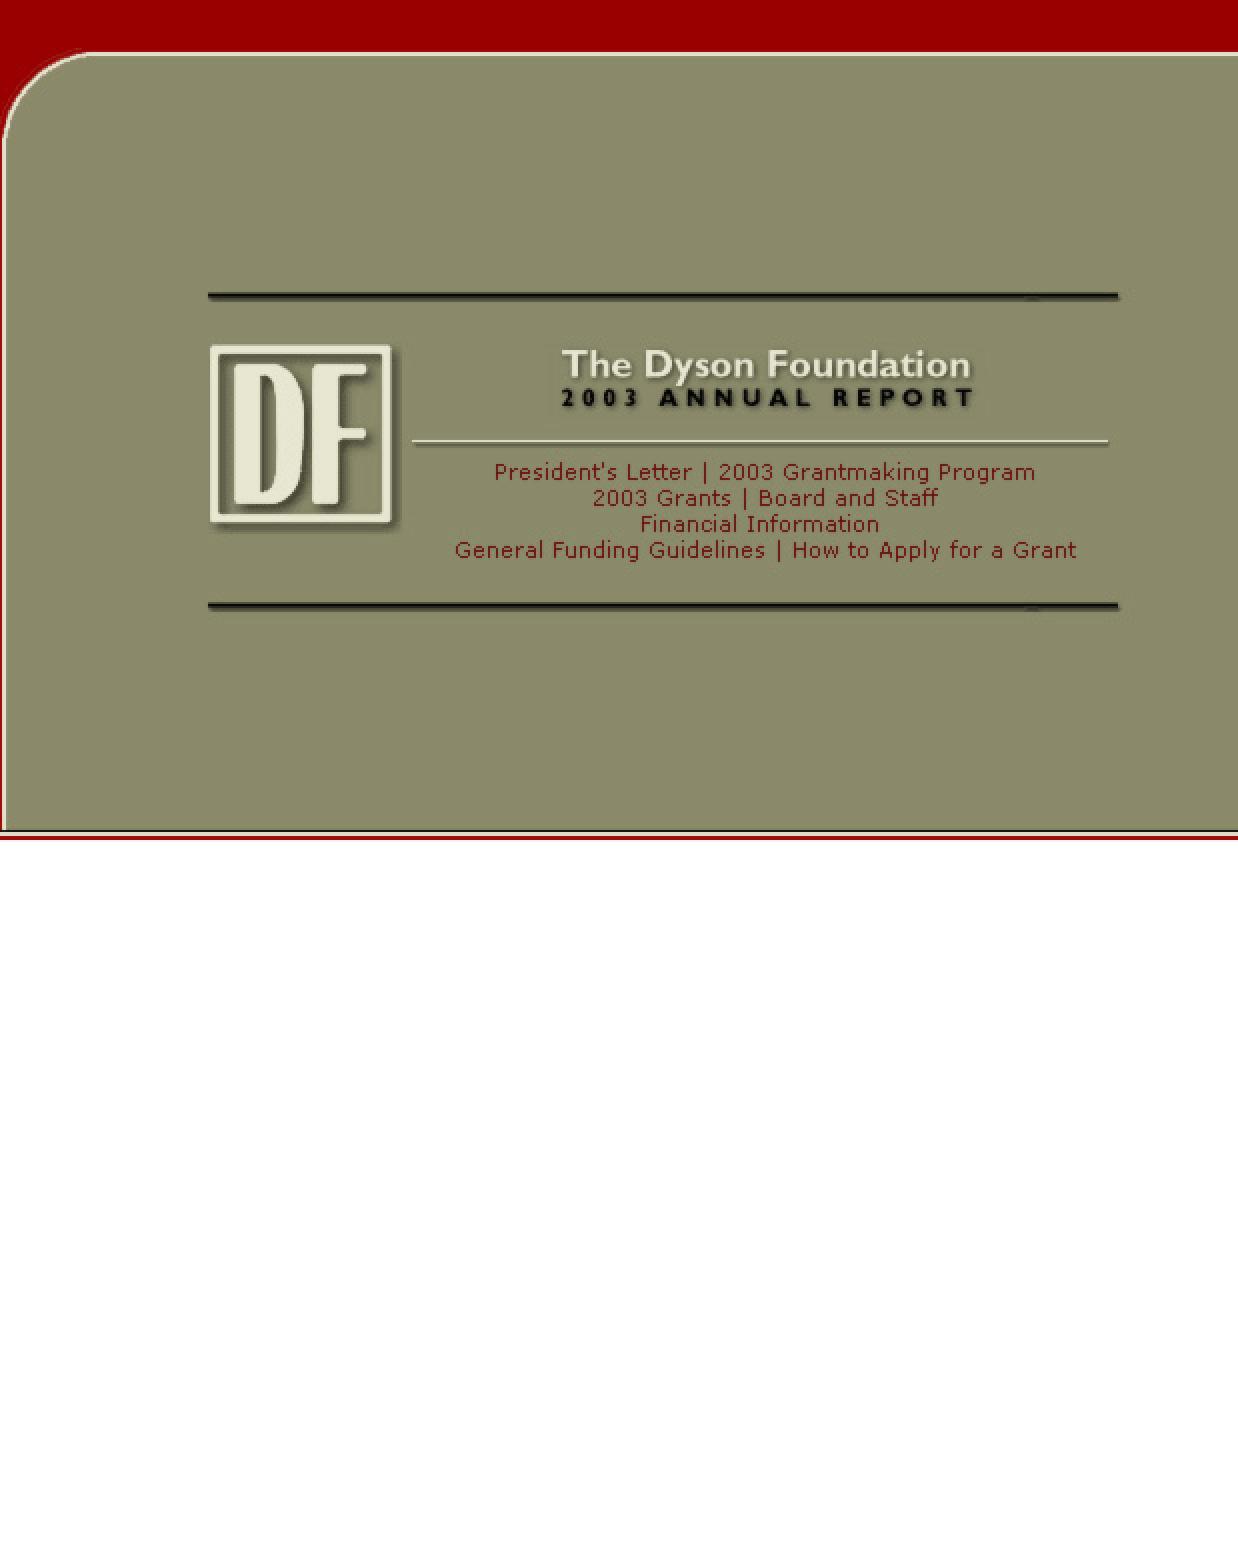 Dyson Foundation - 2003 Annual Report